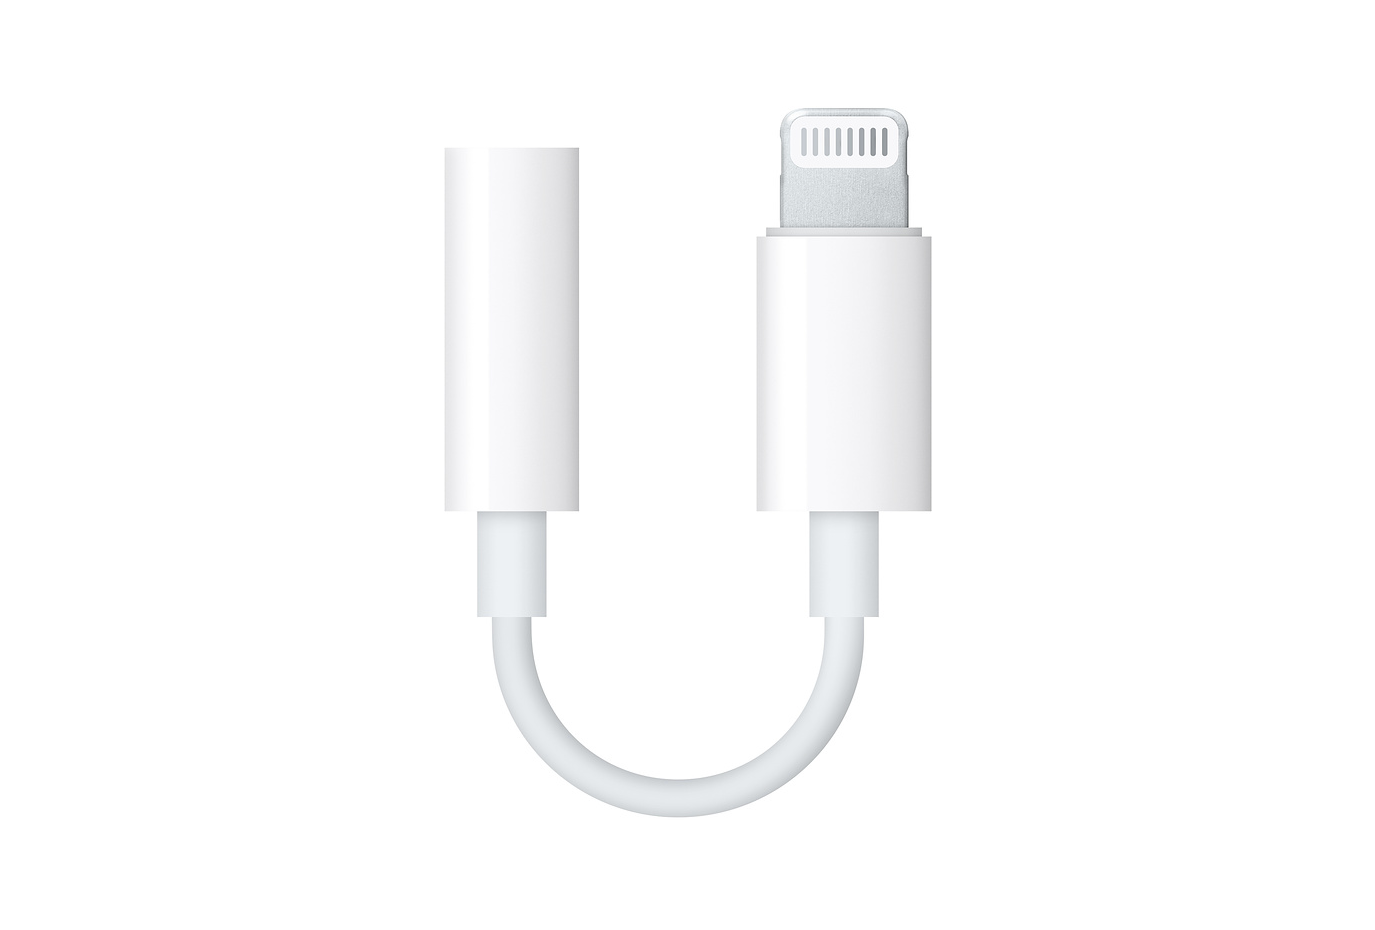 「iPhone XS/XS Max」付属品に3.5mmイヤホン変換アダプタなし!有線接続イヤホン・ヘッドホンは別途購入が必要なので注意